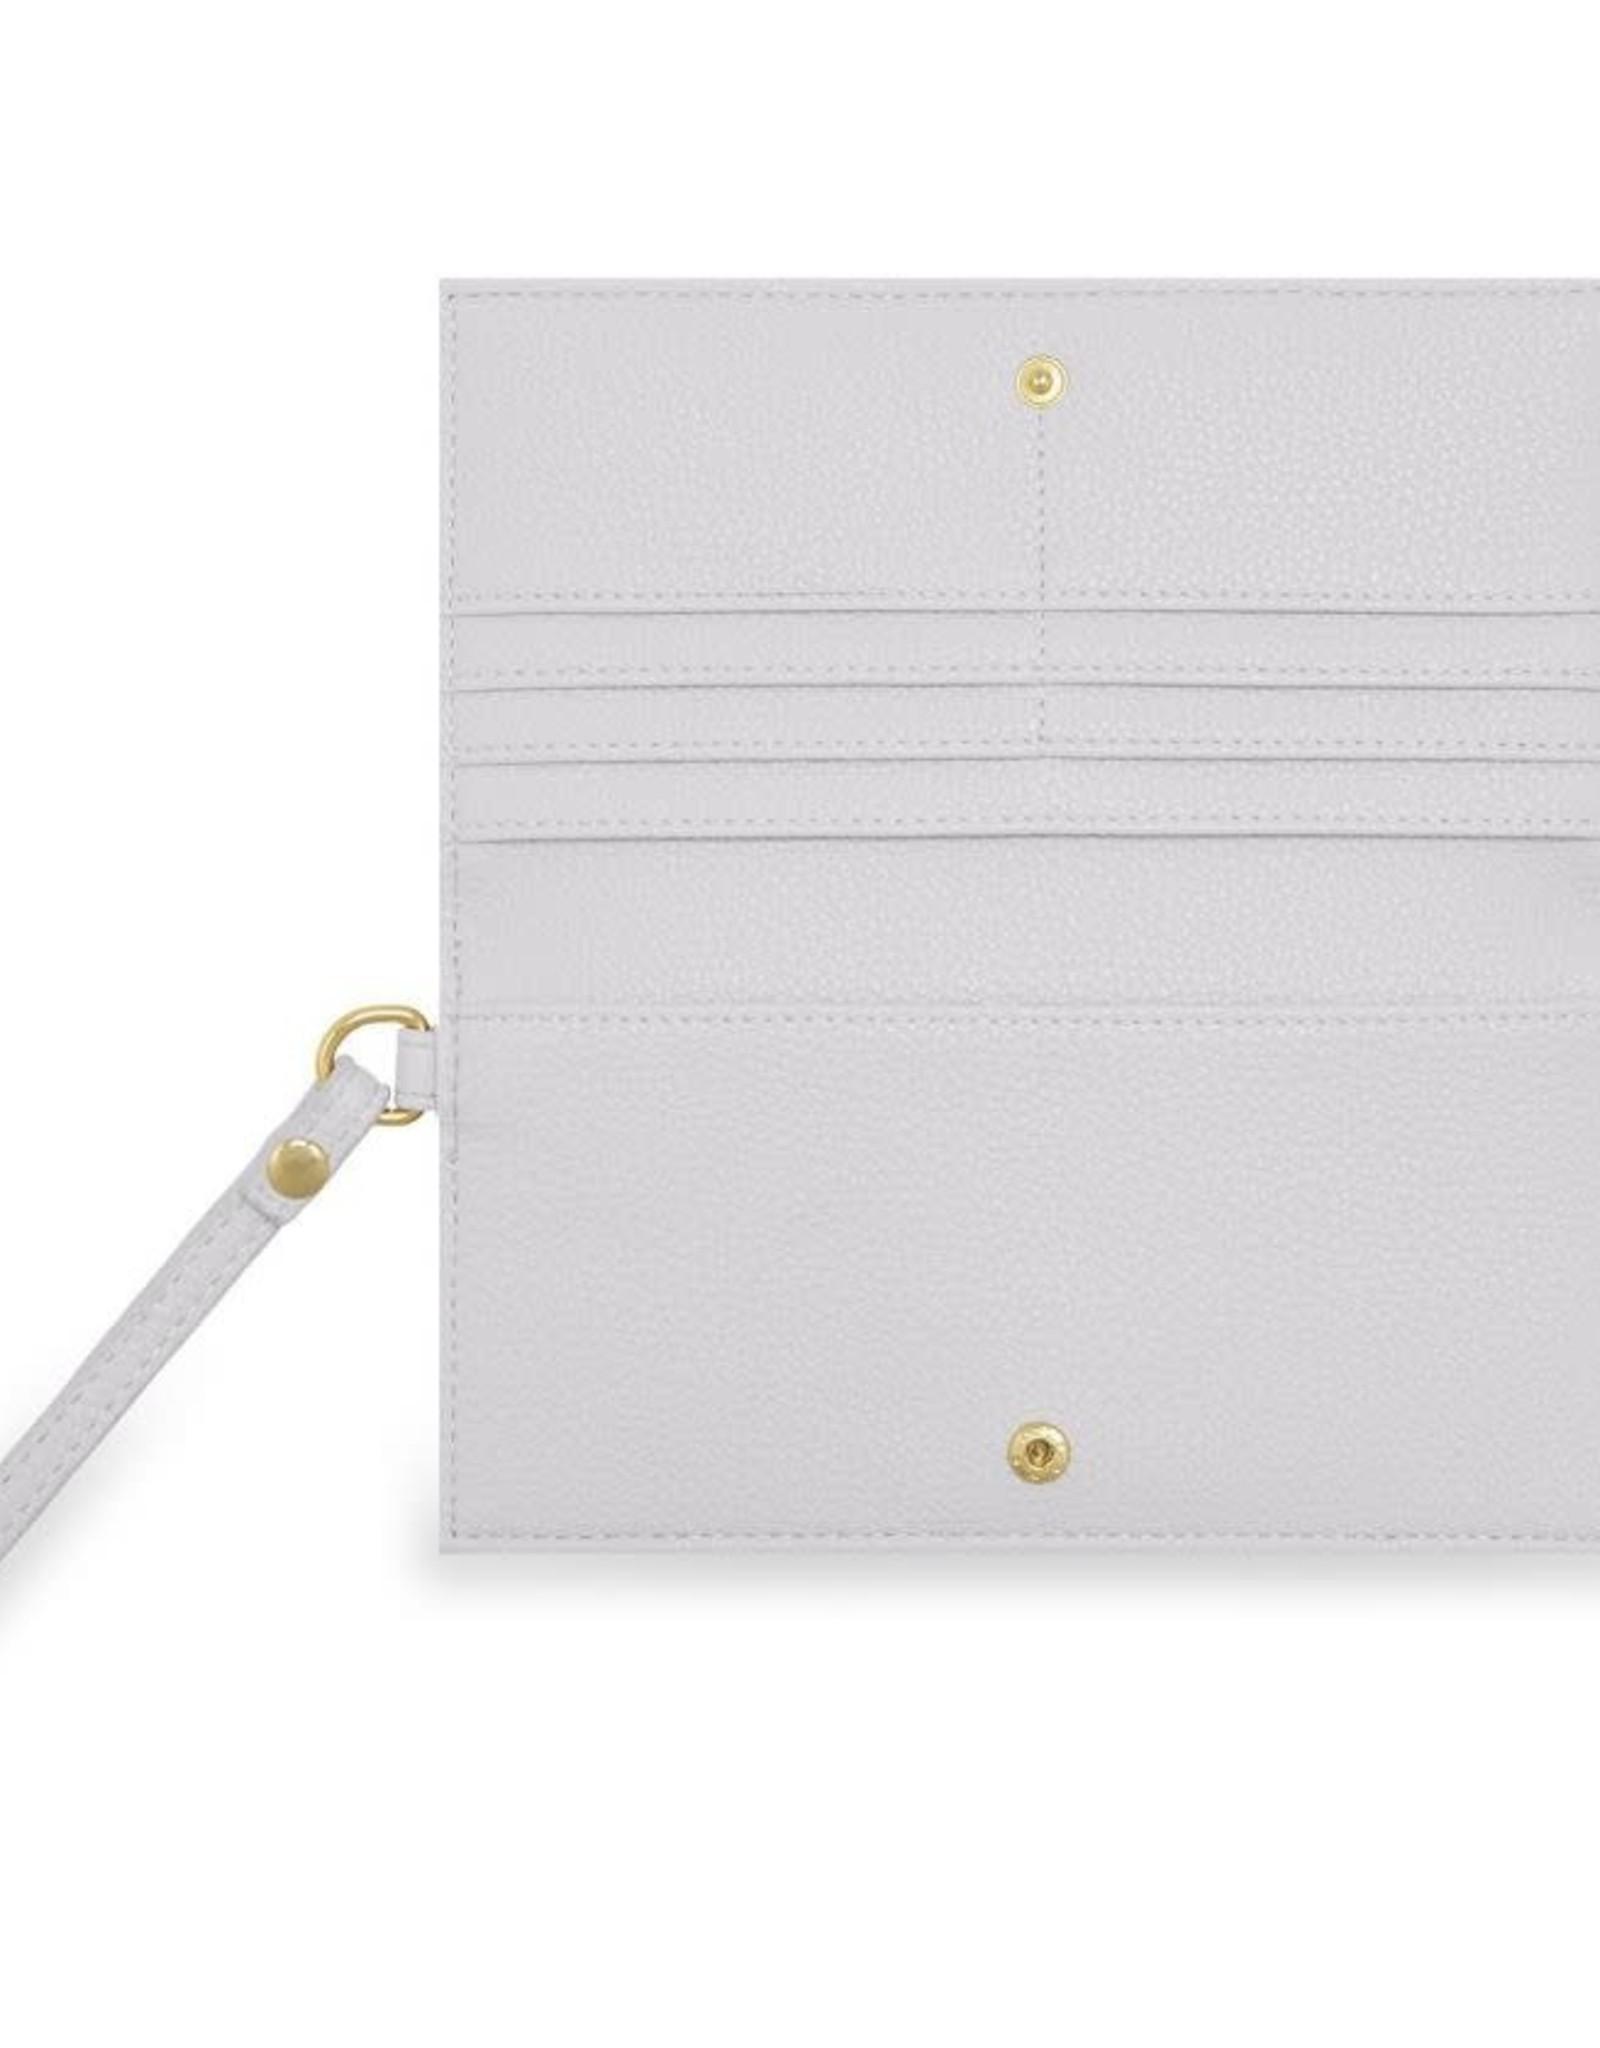 Katie Loxton Cleo Wristlet Pale Grey